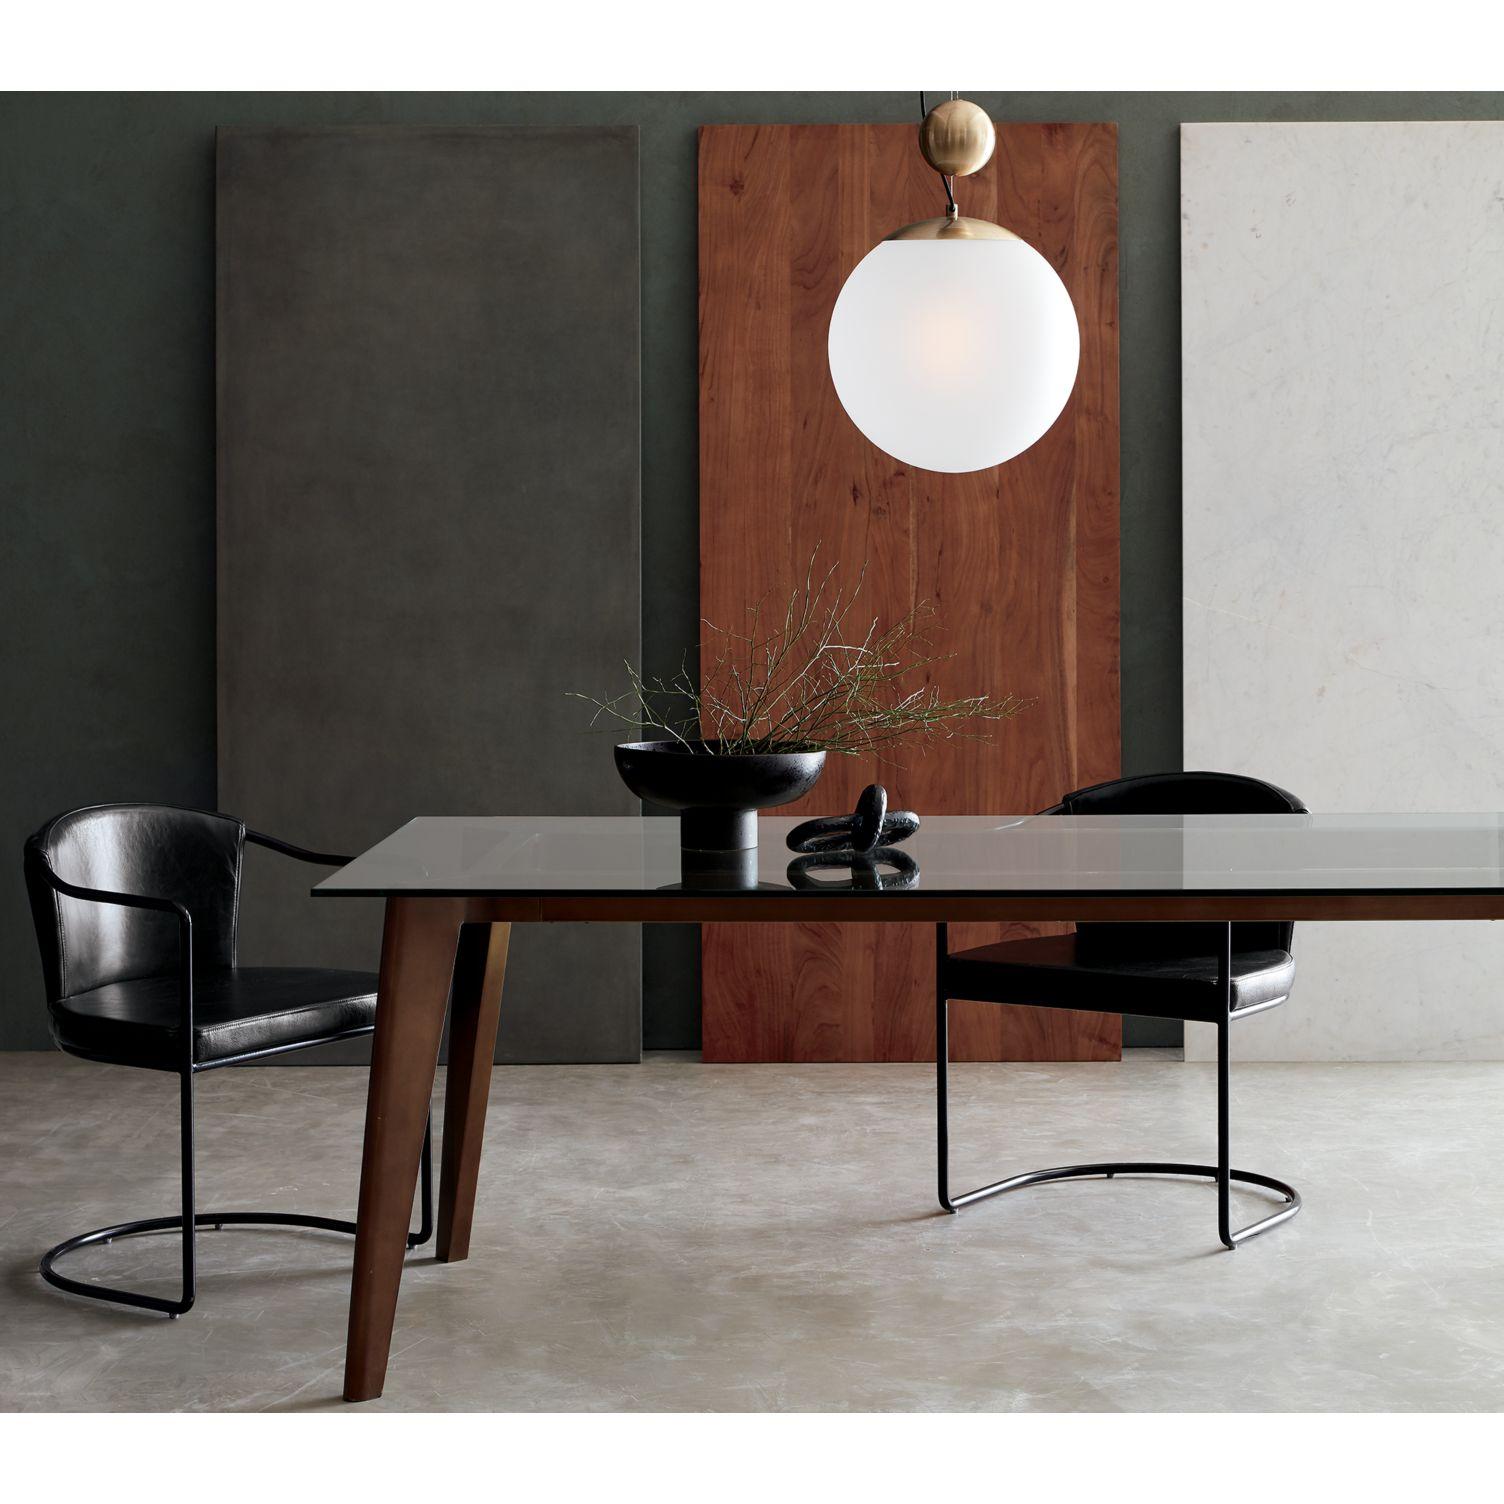 Black-pedestal-bowl-from-CB2